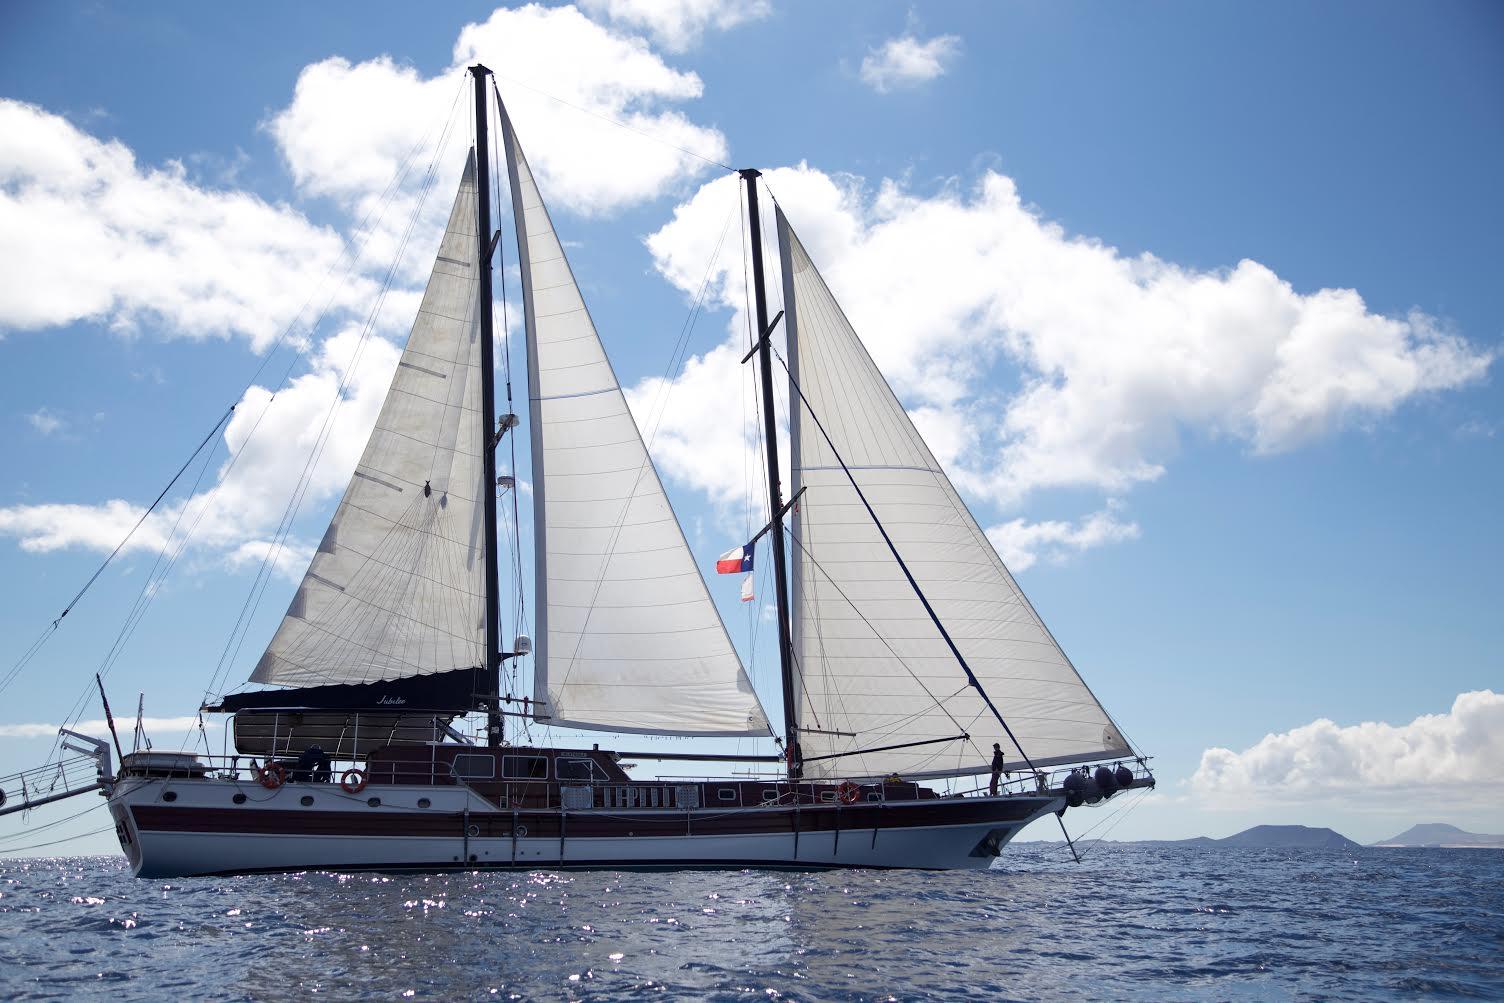 Panama, Red Frog Marina Resort /Bastimentos. Classic wooden sailing yacht